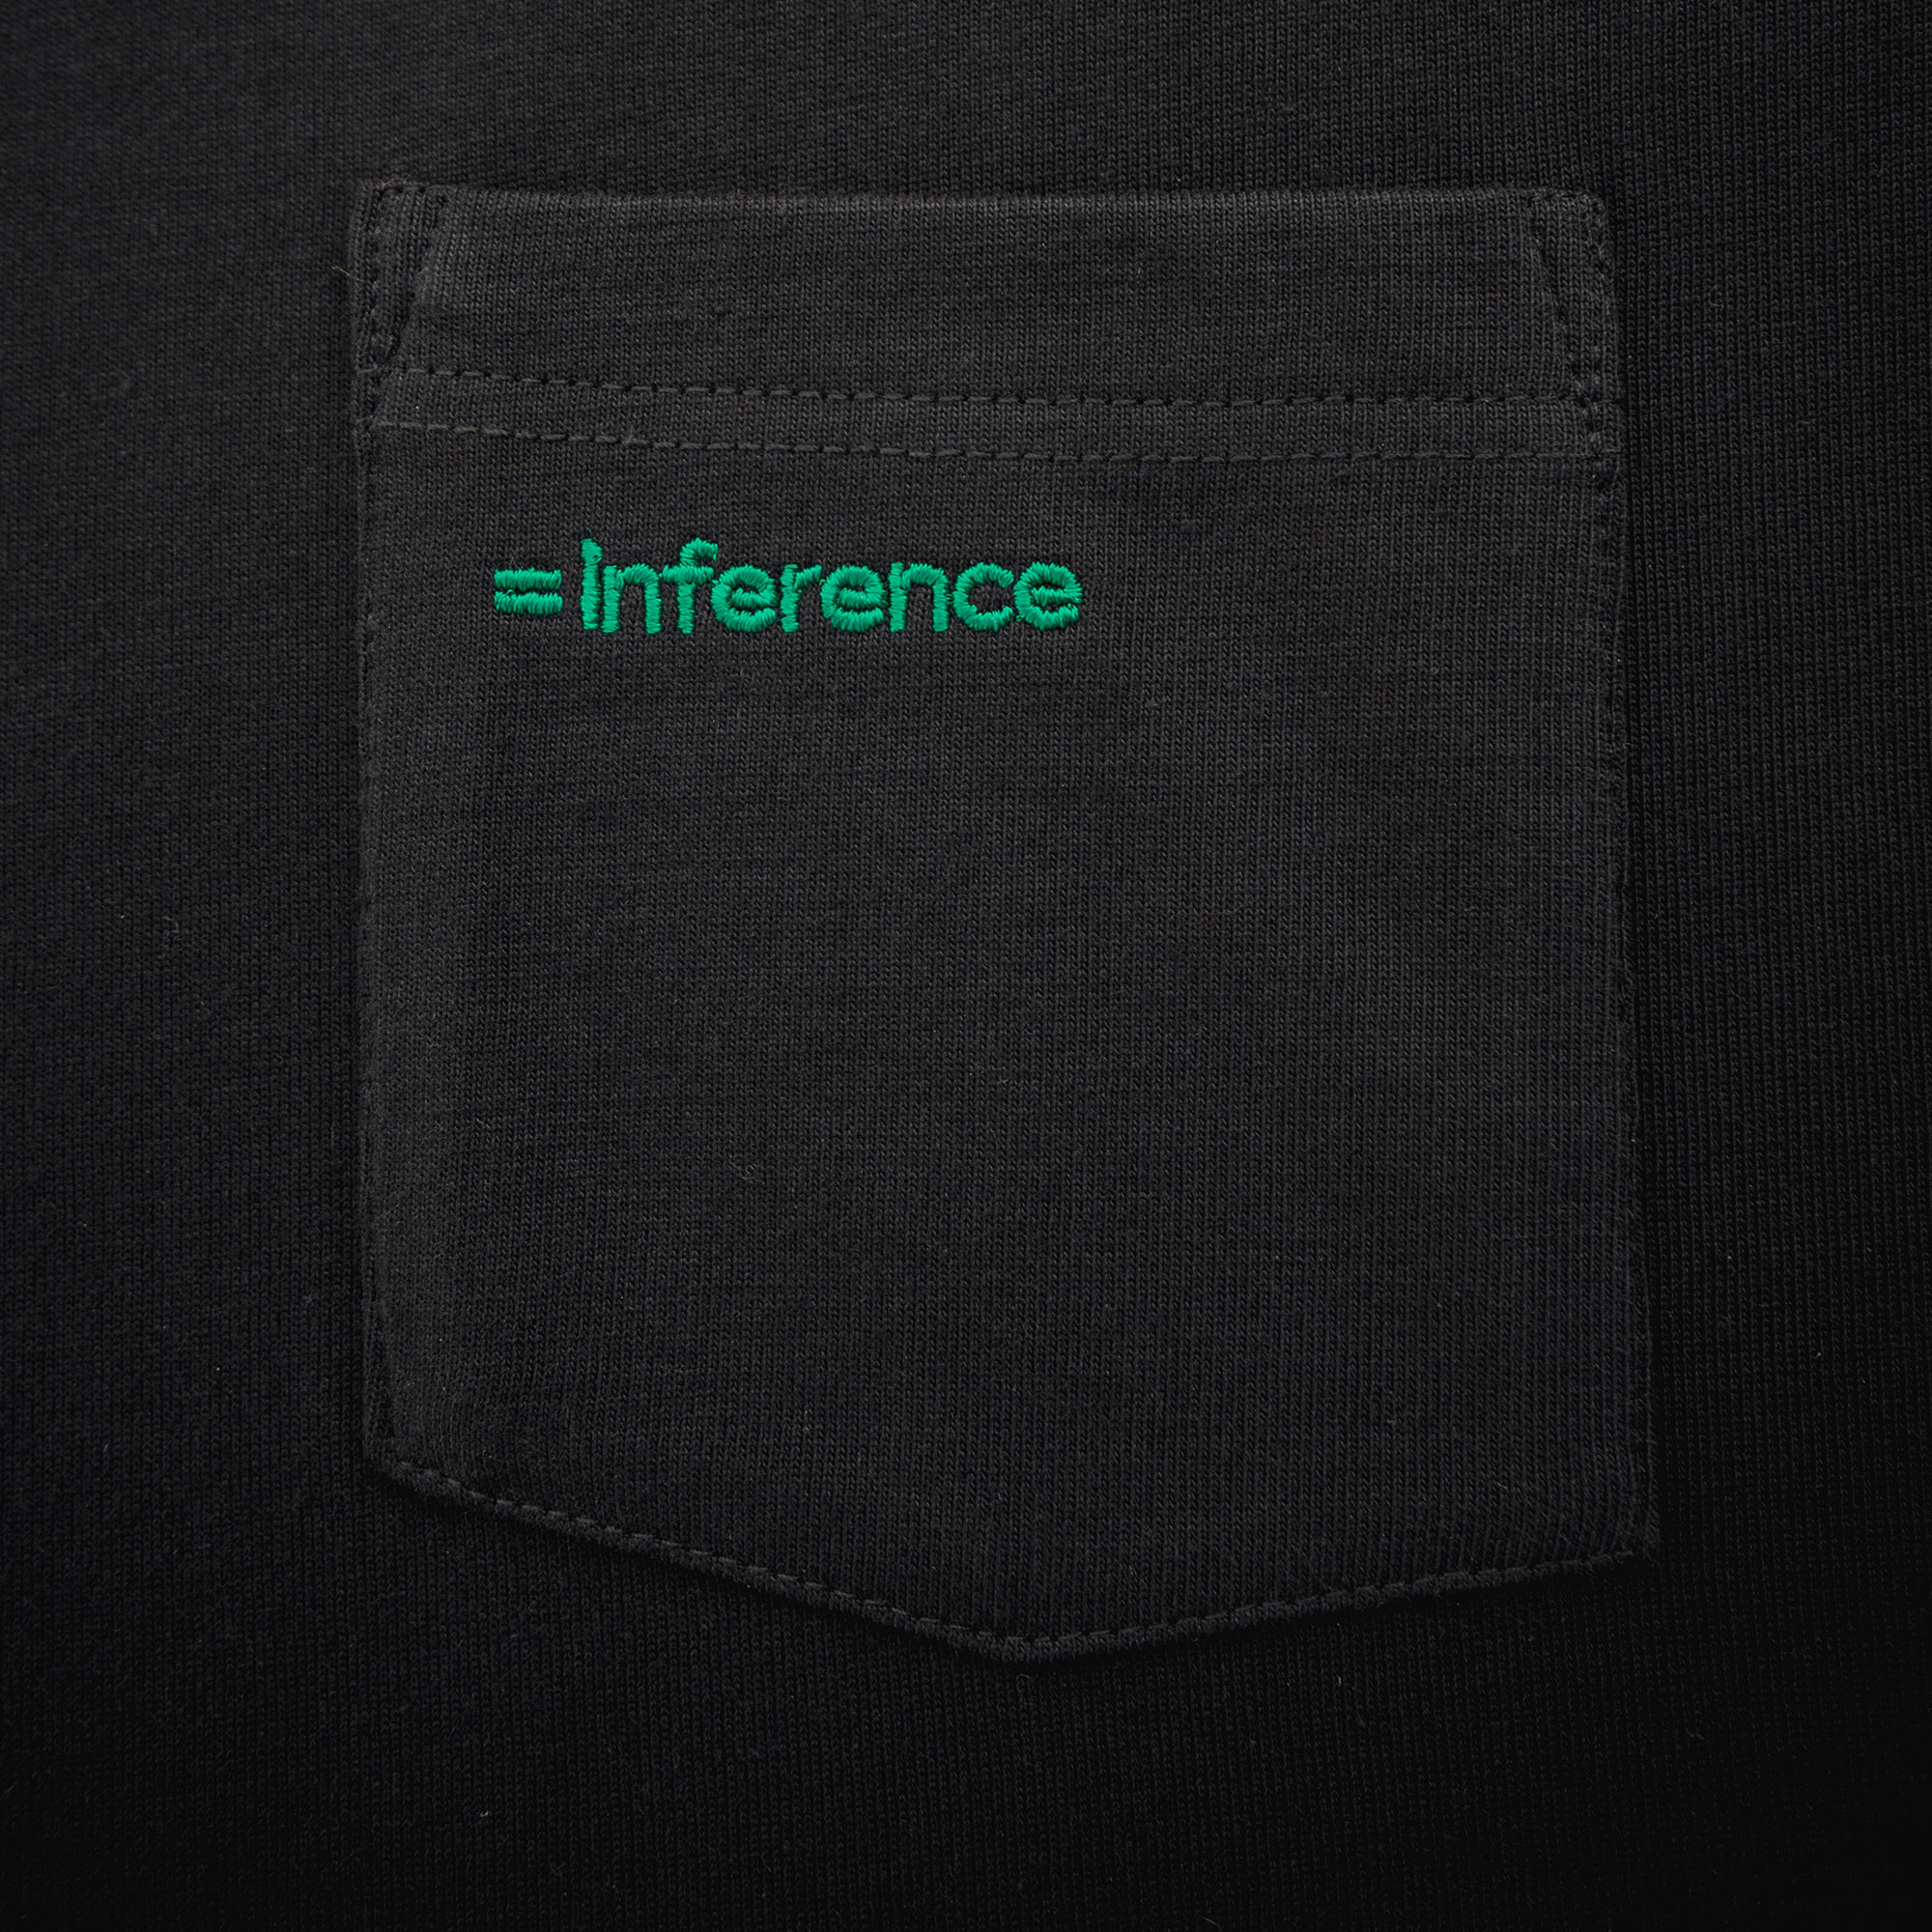 Inference_Pocket_007-1_002